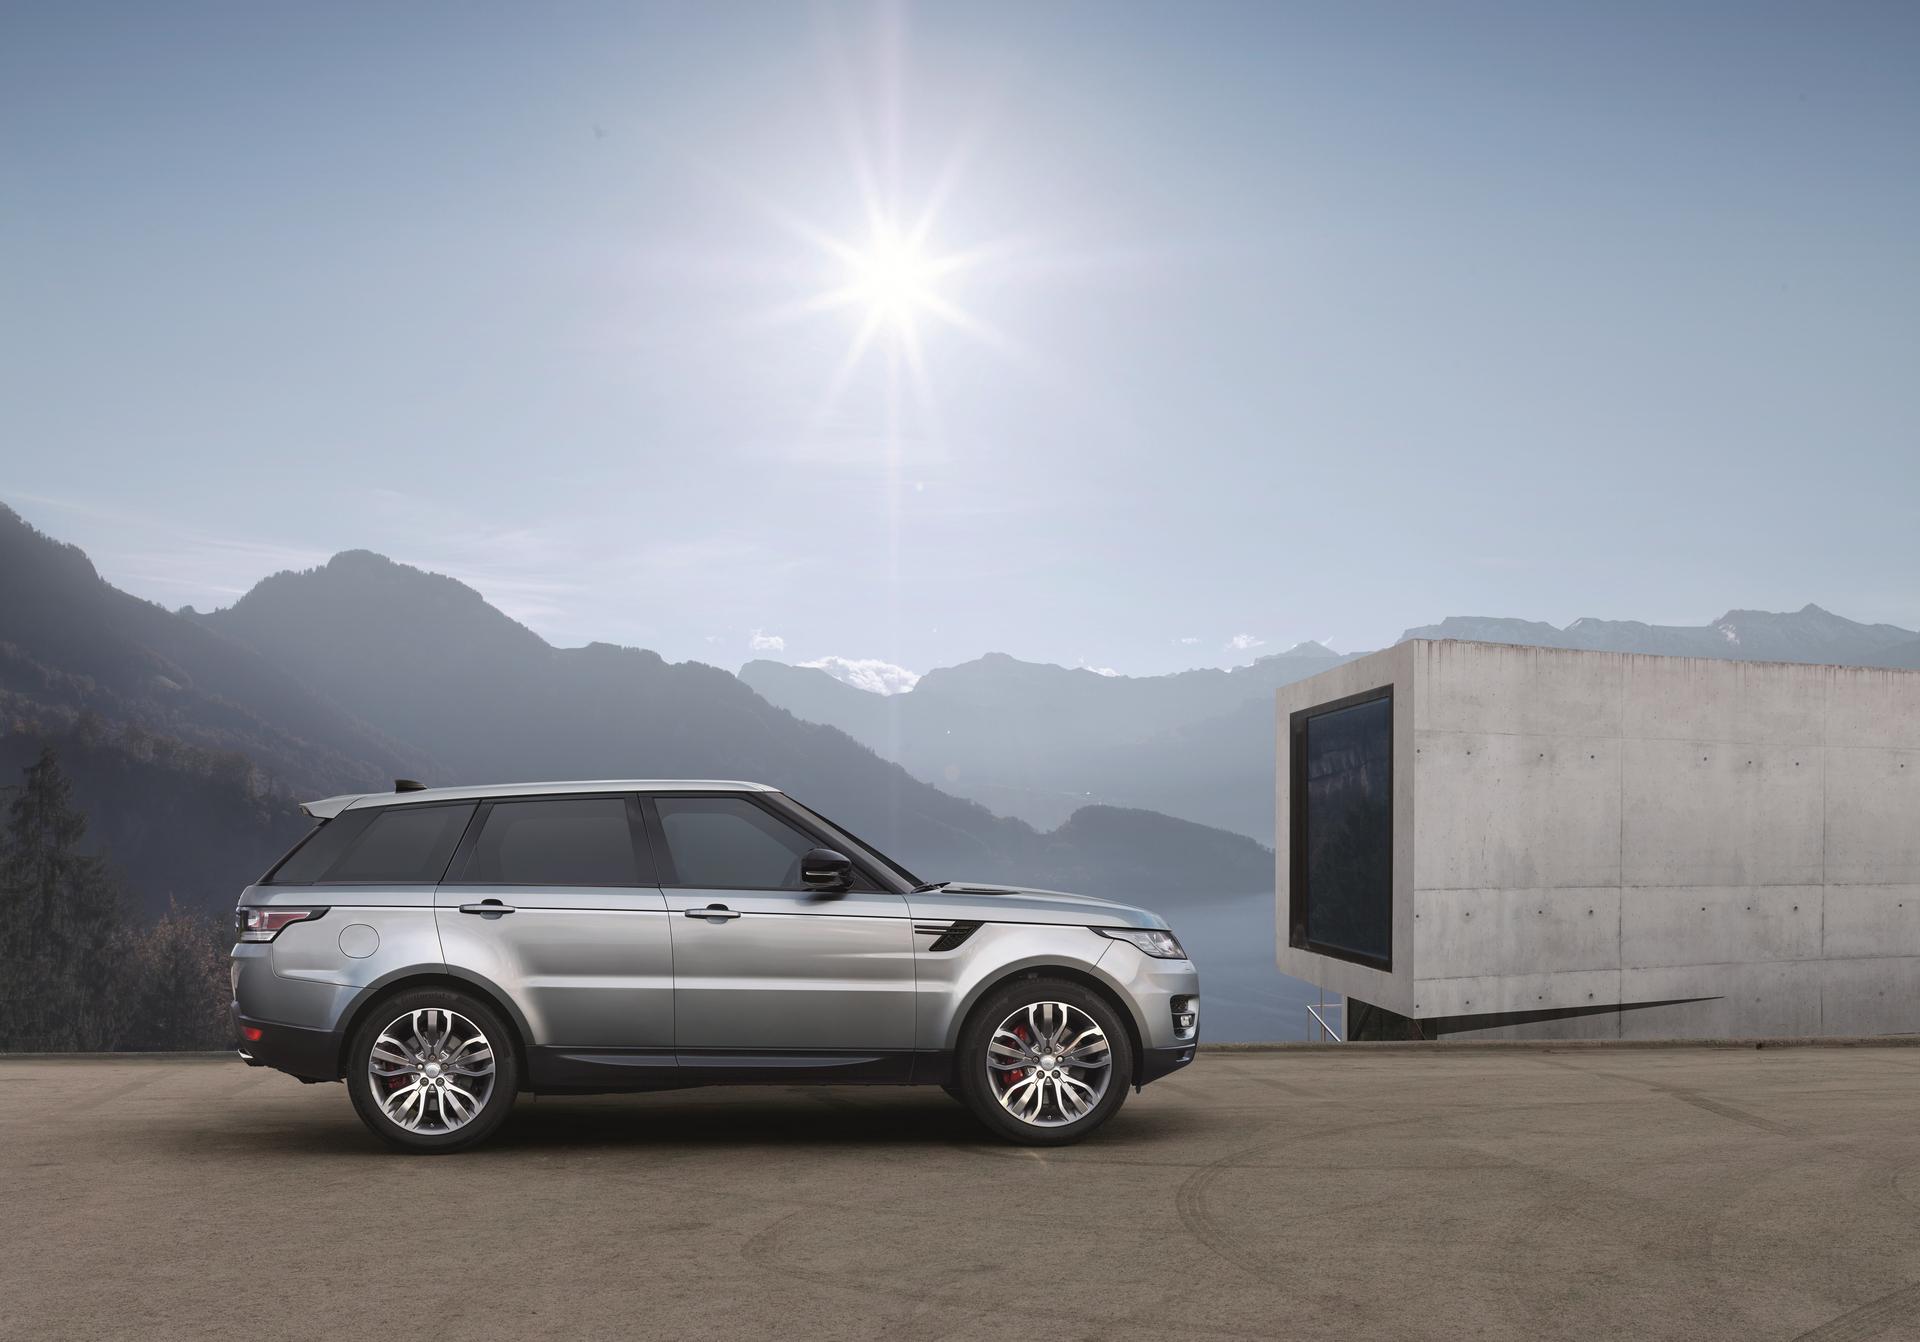 2017 Range Rover Sport © Tata Group